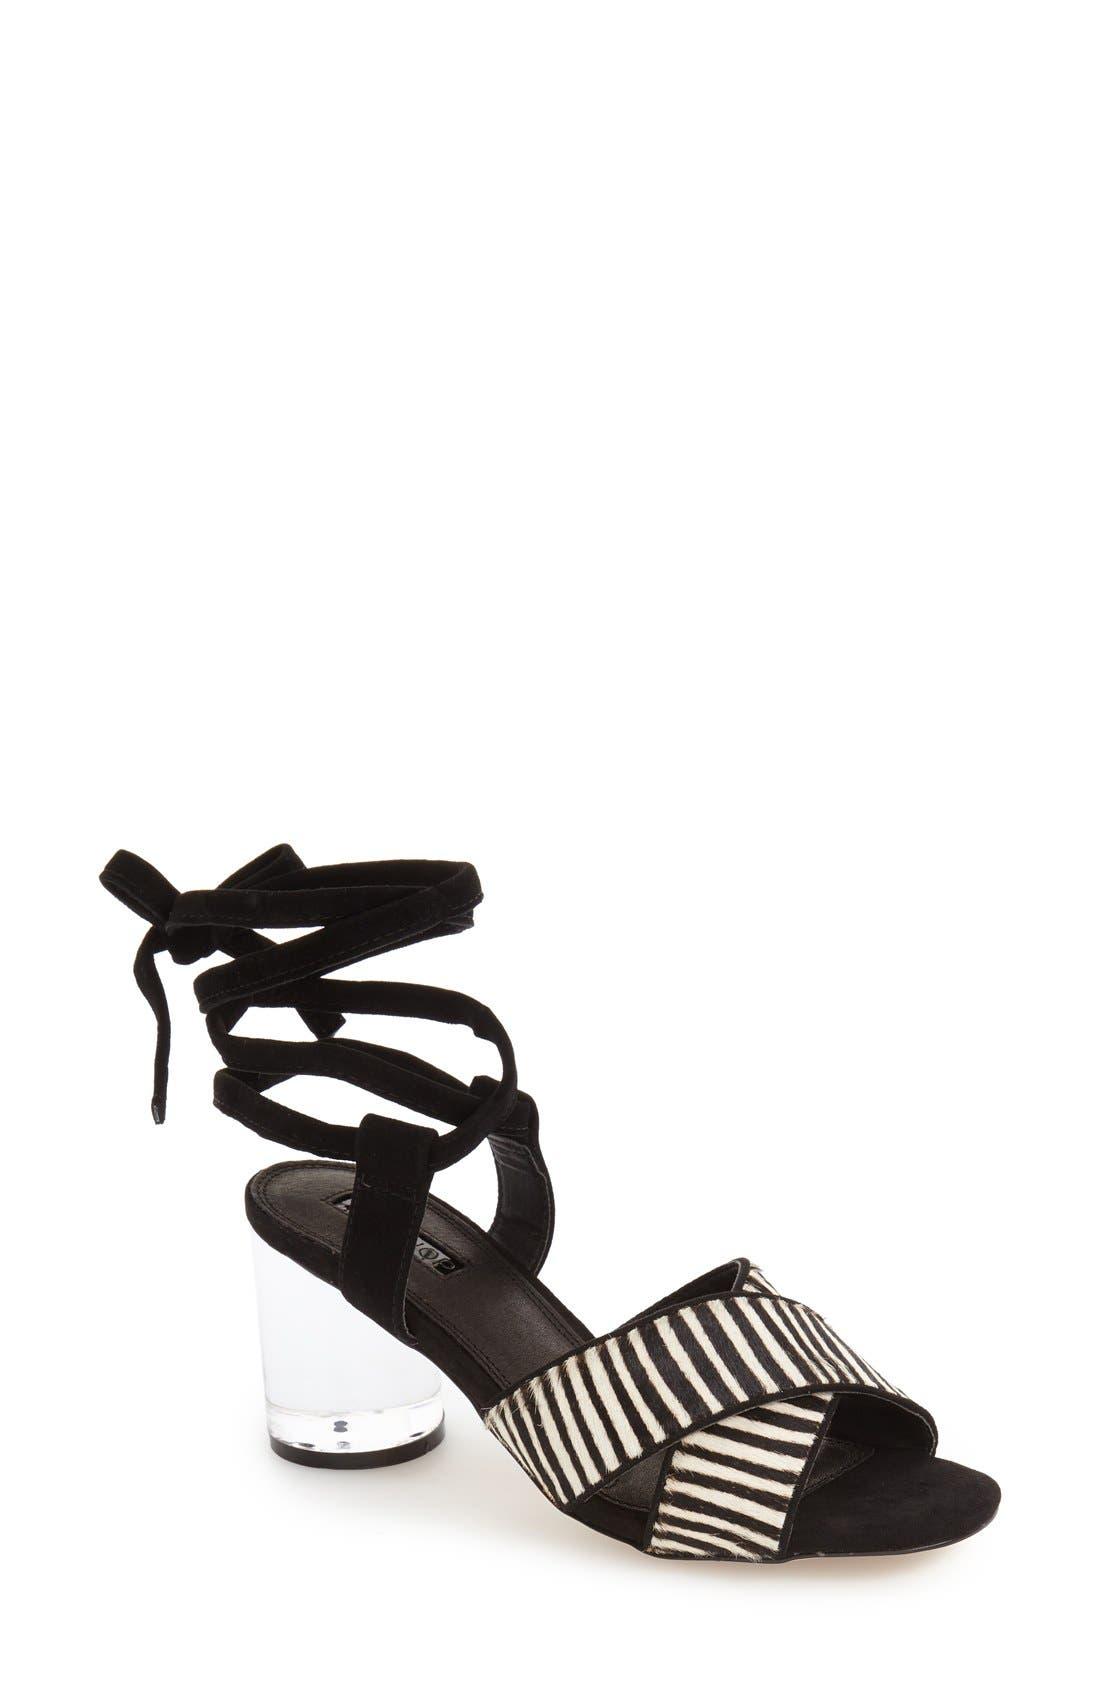 TOPSHOP 'Raffle' Ankle Strap Sandal